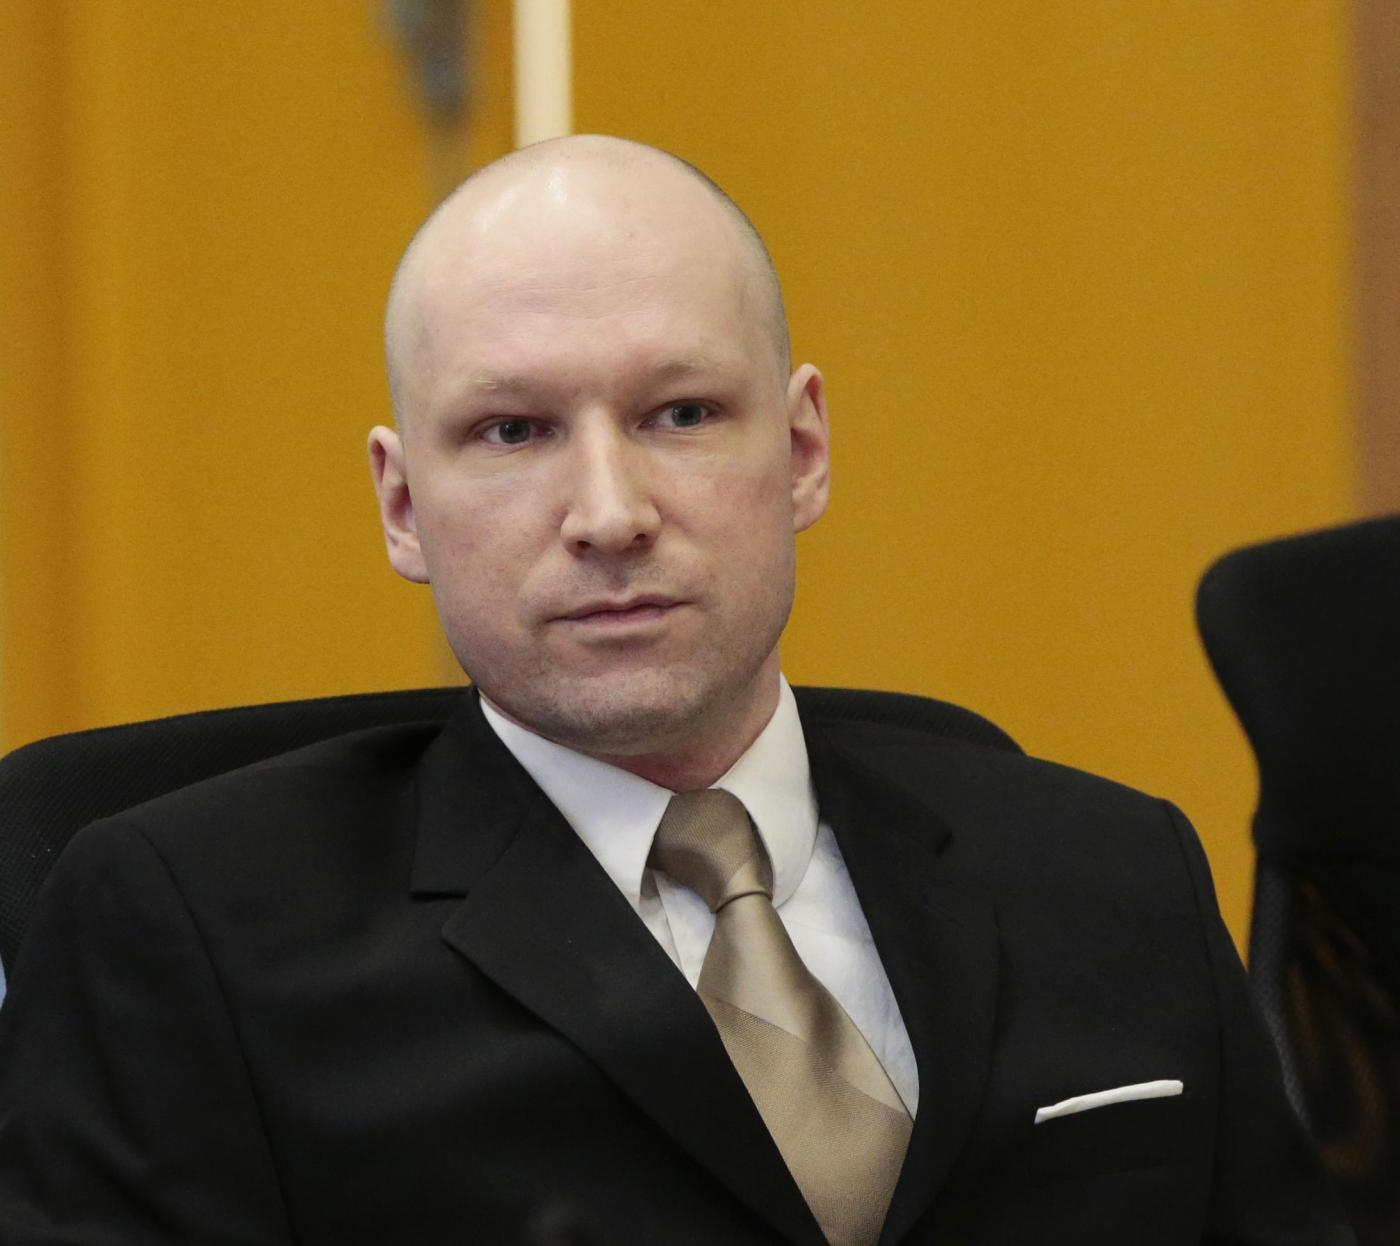 Norvegia: Breivik a processo, saluto nazista in aula